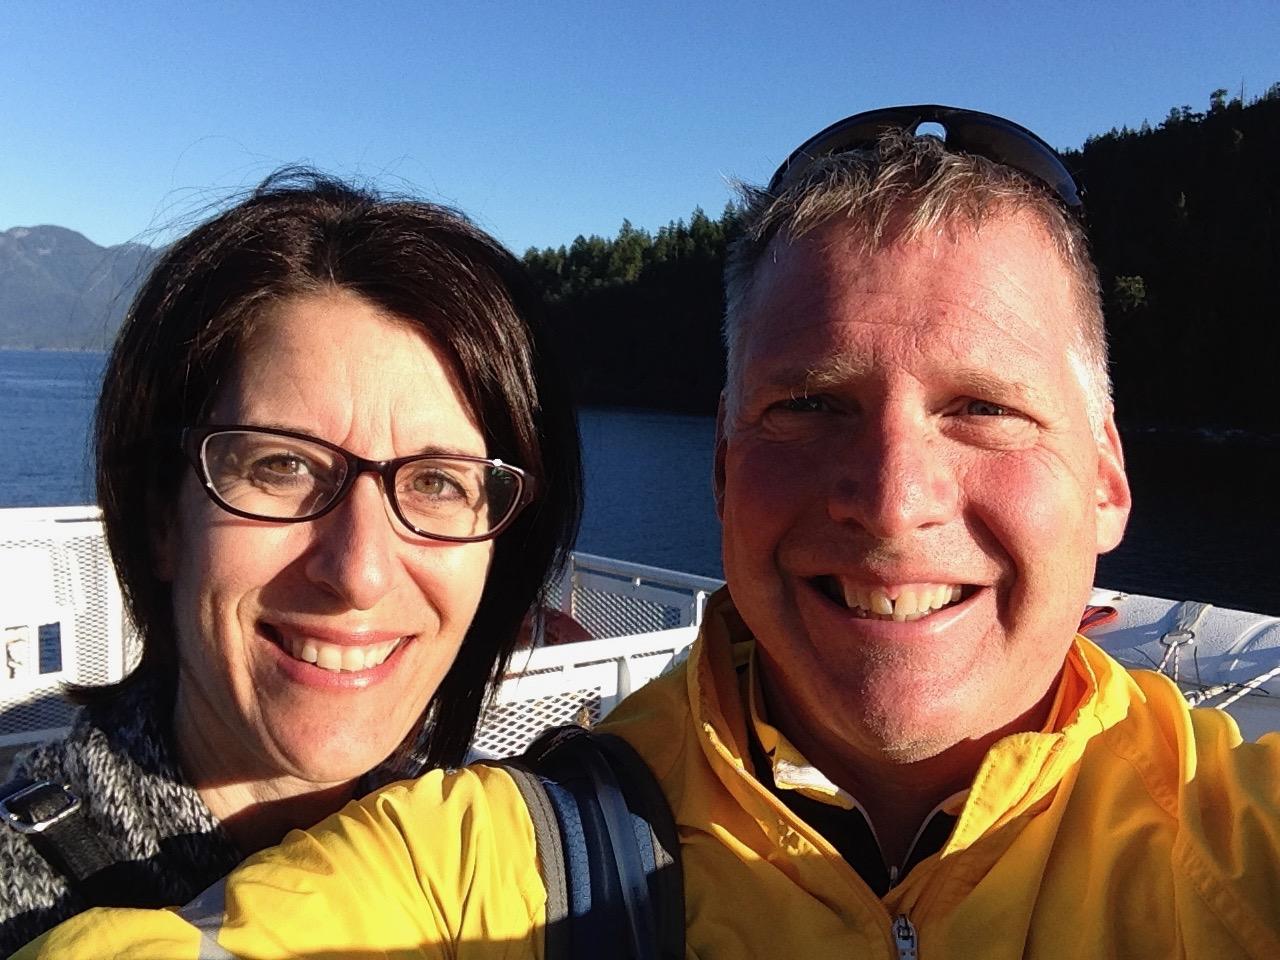 Gord and Jill Hotchkiss   On a Cycling Trip on BC's Sunshine Coast